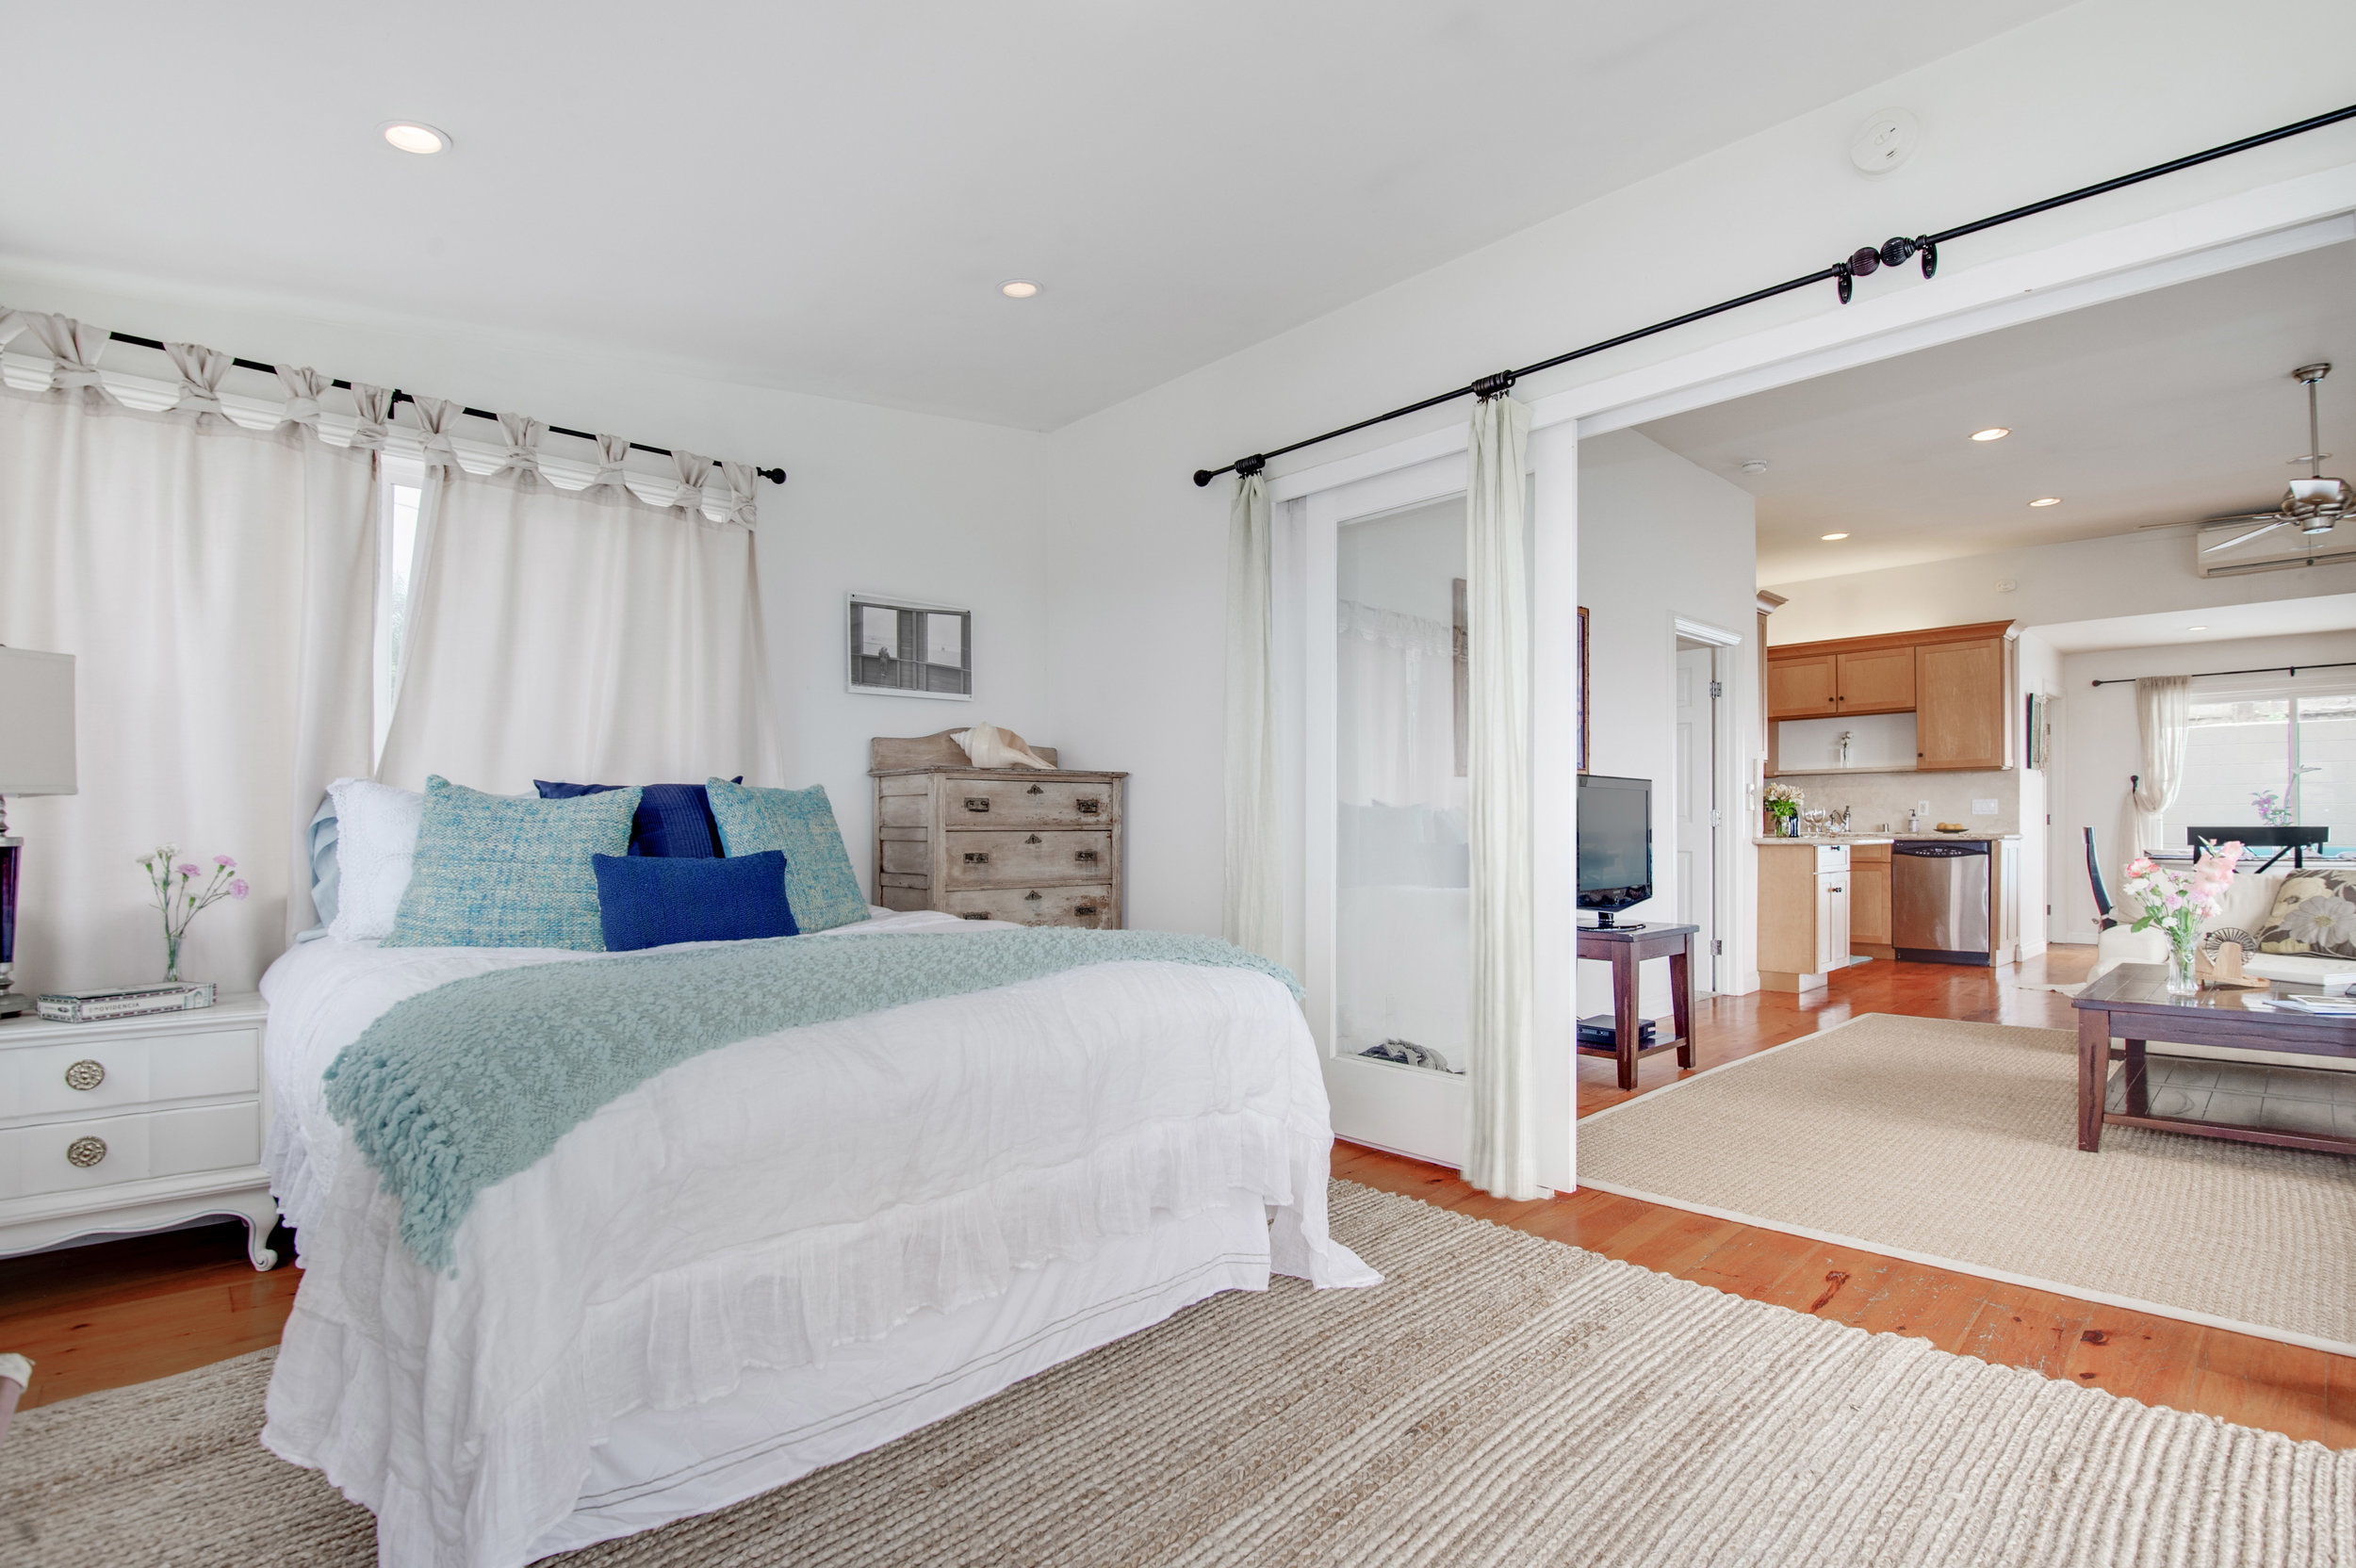 008 Bedroom 3952 Las Flores For Sale Lease The Malibu Life Team Luxury Real Estate.jpg